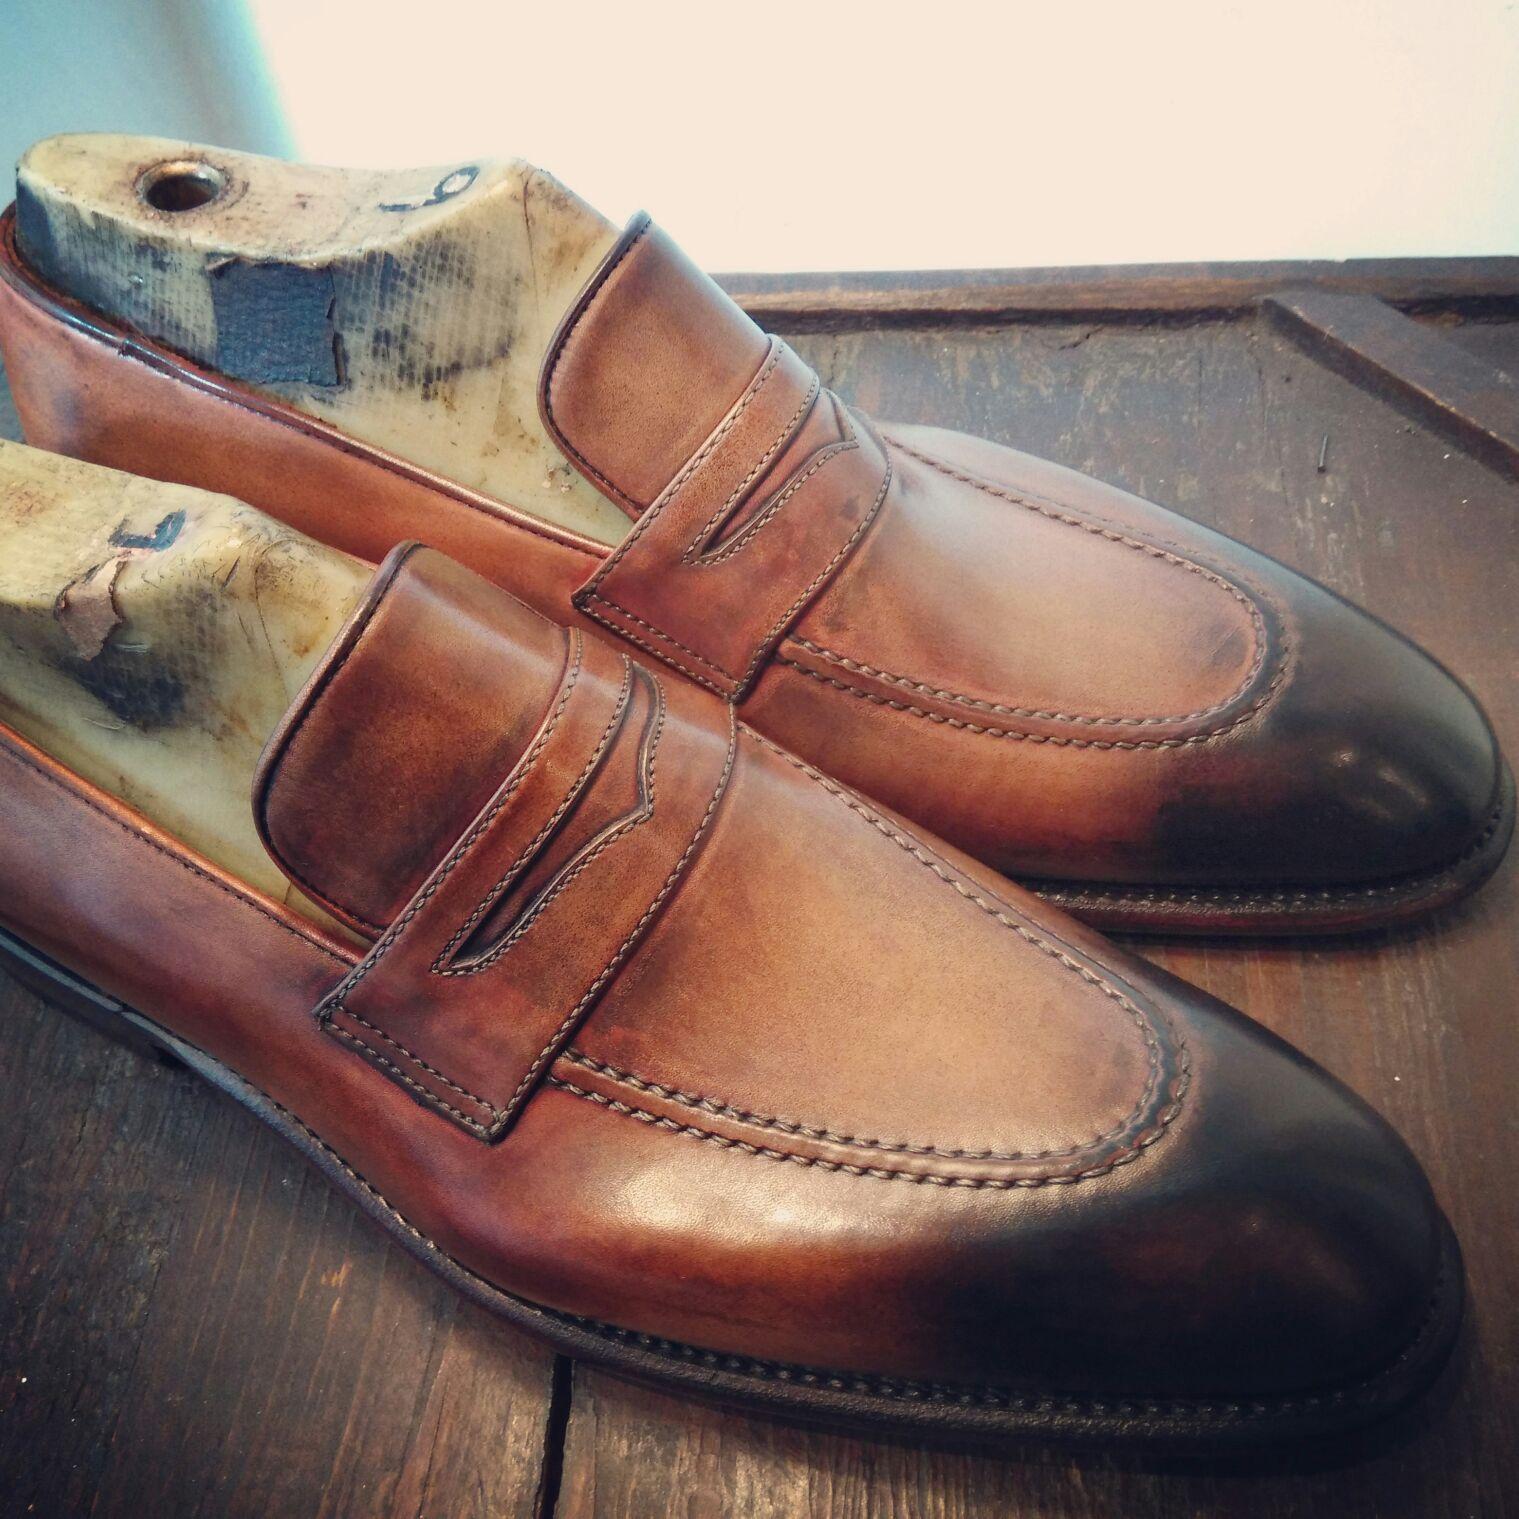 Scarpe artigianali Firenze